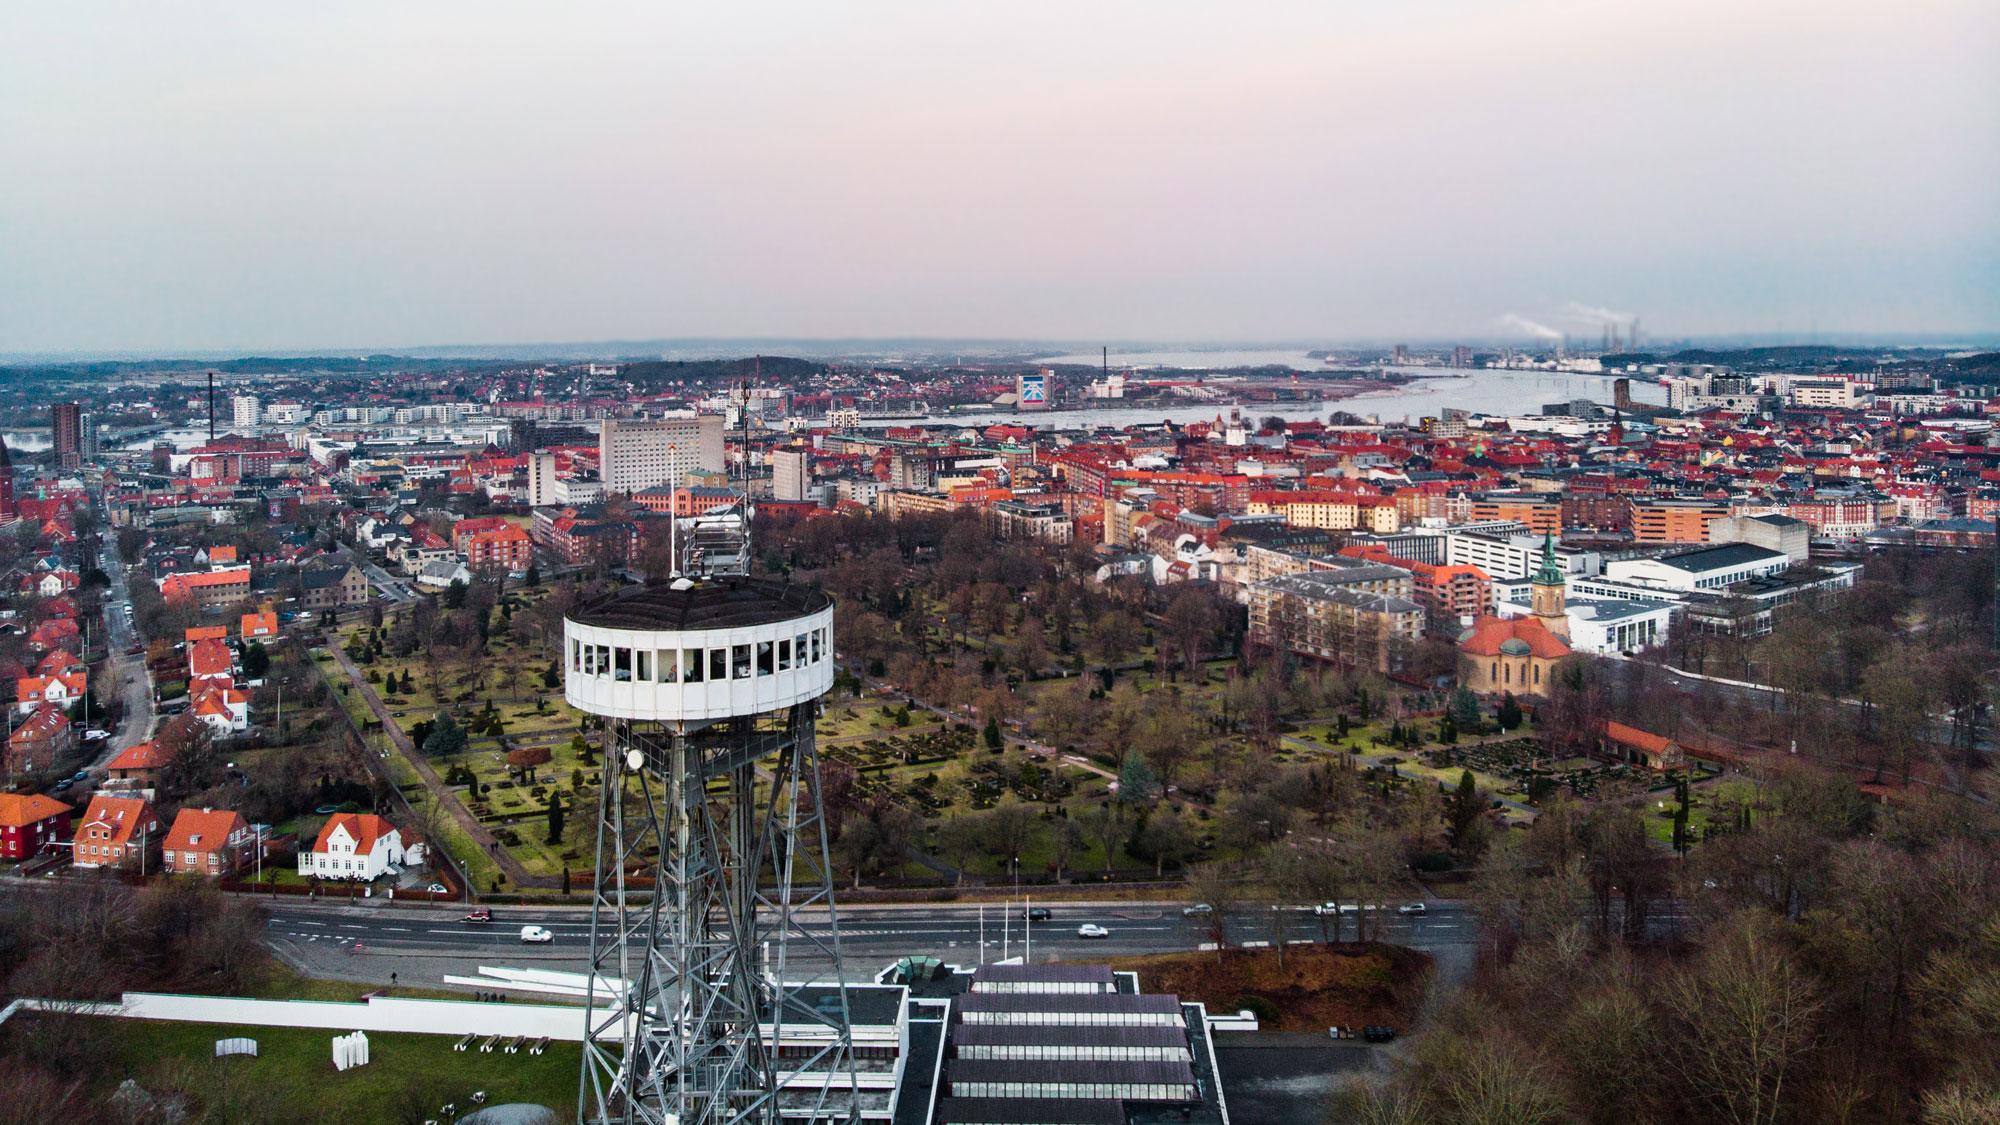 Nye indbyggere strømmer til byen: Aalborg Kommune vil lægge ny boligstrategi